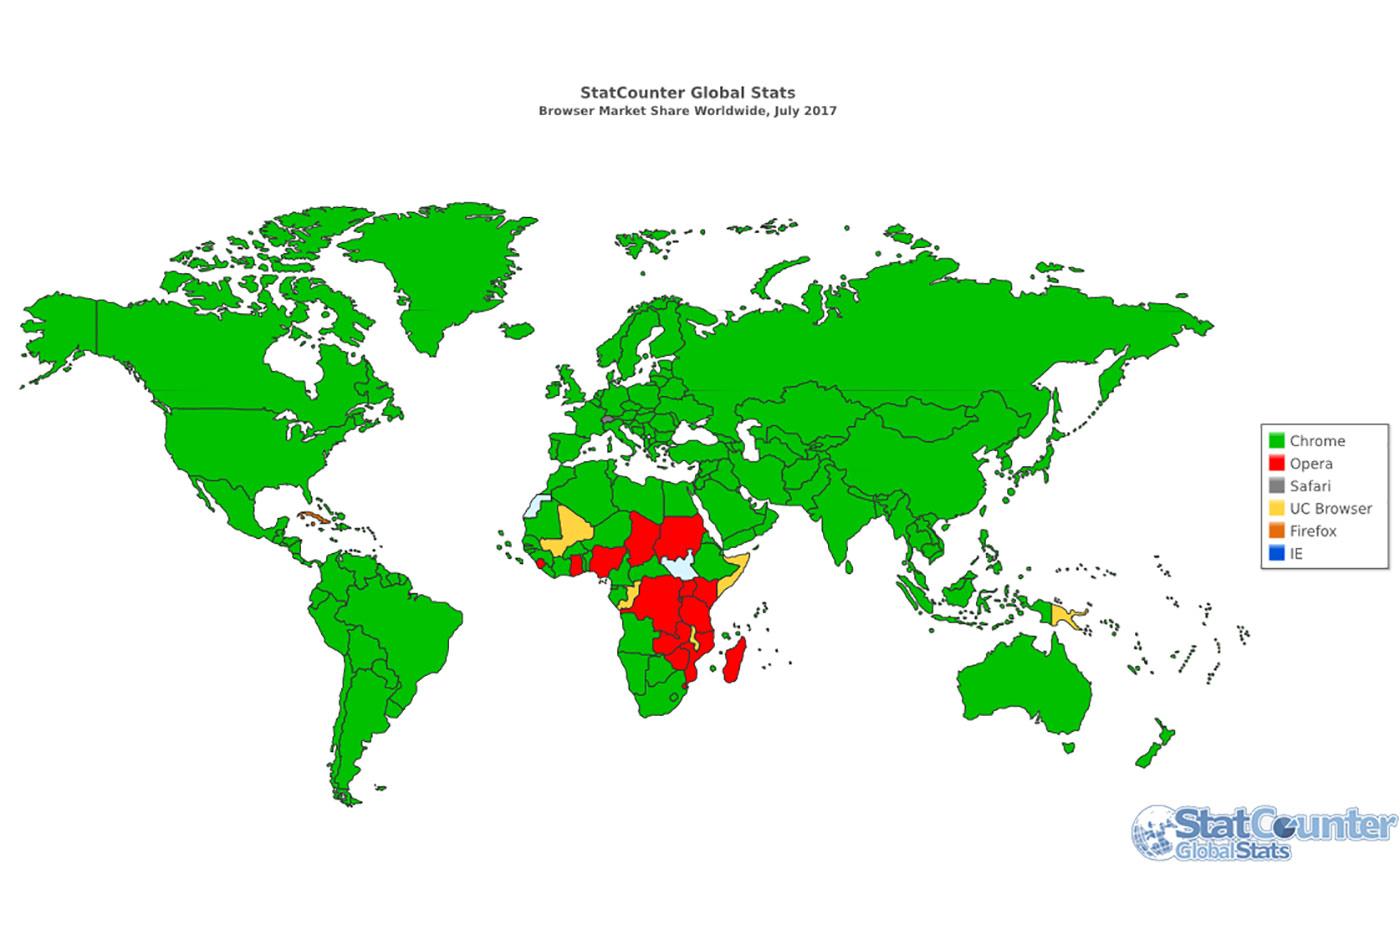 Browser Market Share Worldwide July 2017